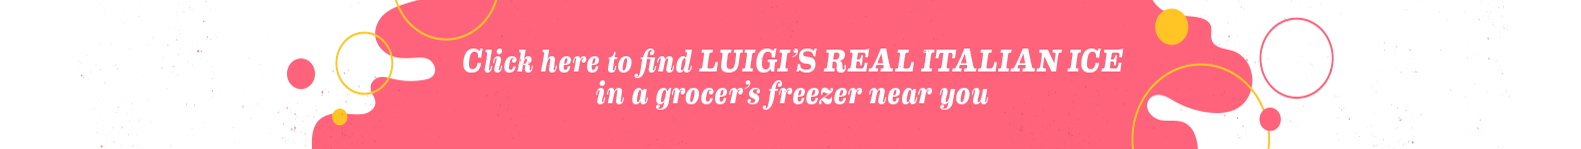 Where to Buy LUIGI'S Real Italian Ice